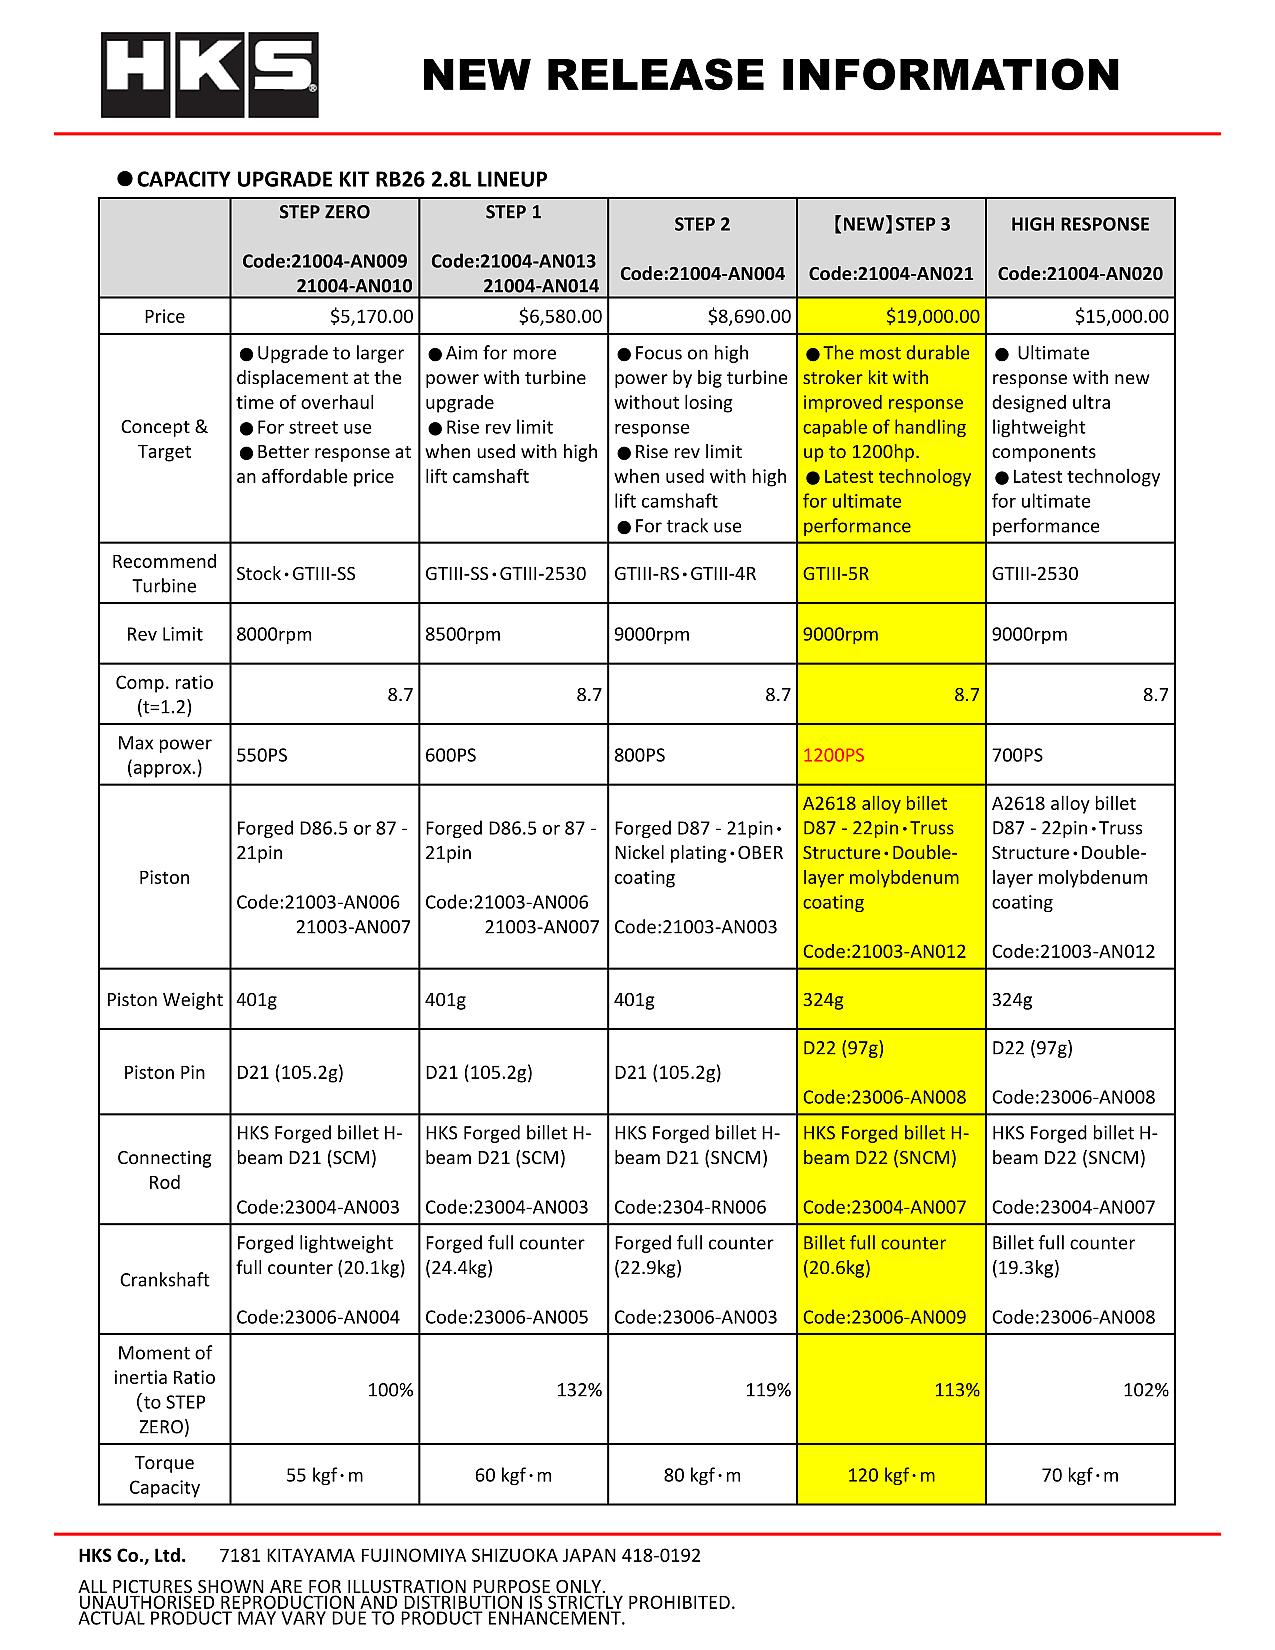 21004-AN021 PISTON FULL KIT RB26 2.8L STEP3_2.png